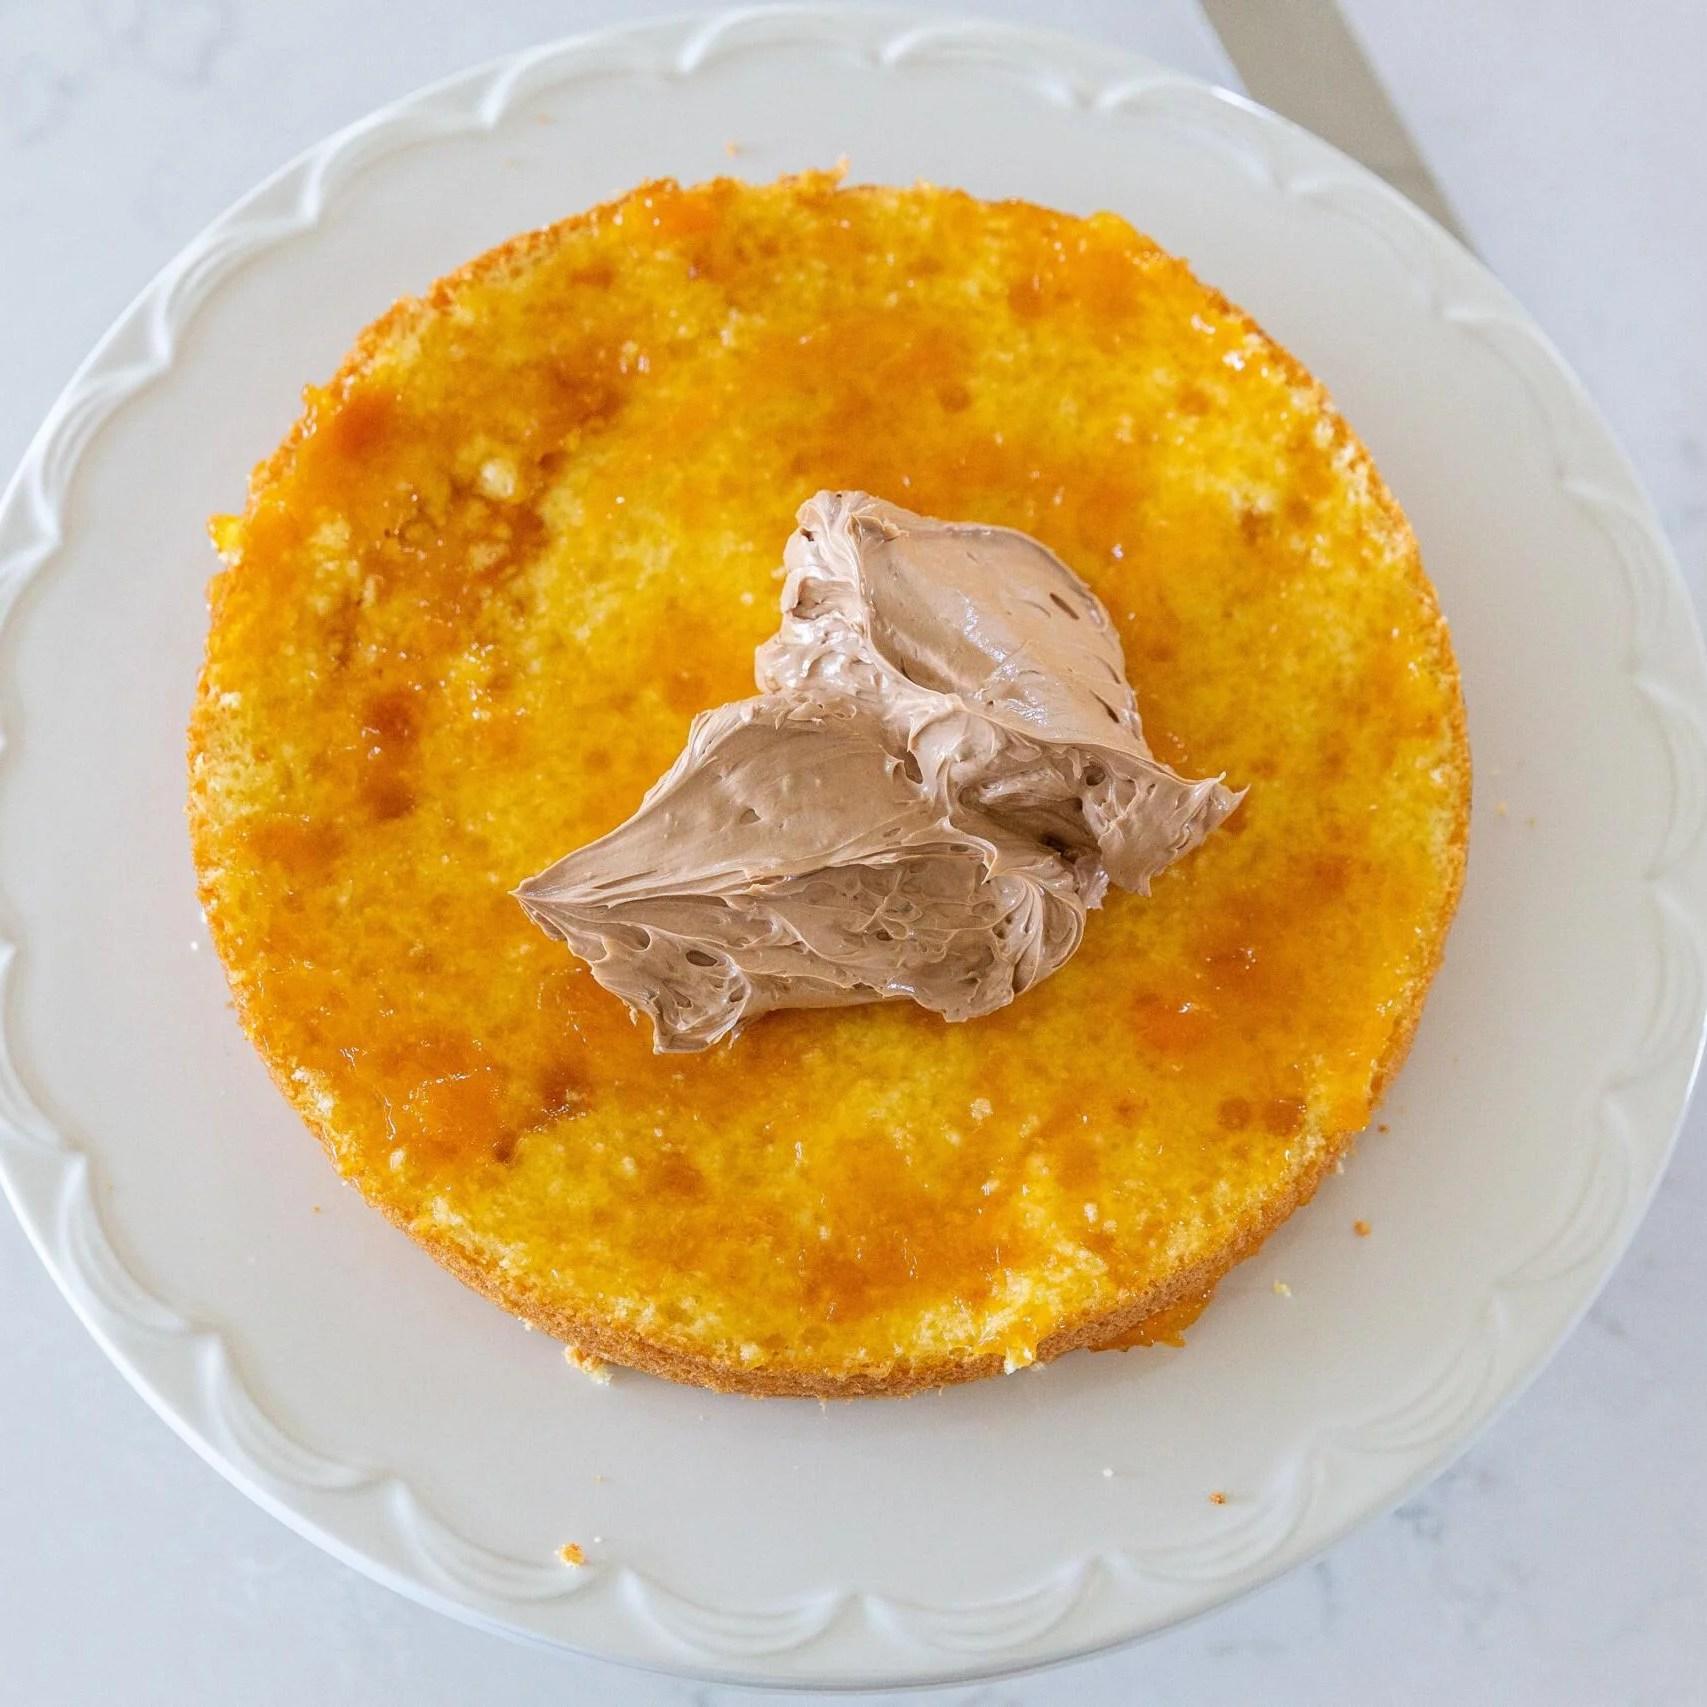 Cream added to the sponge cake with jam